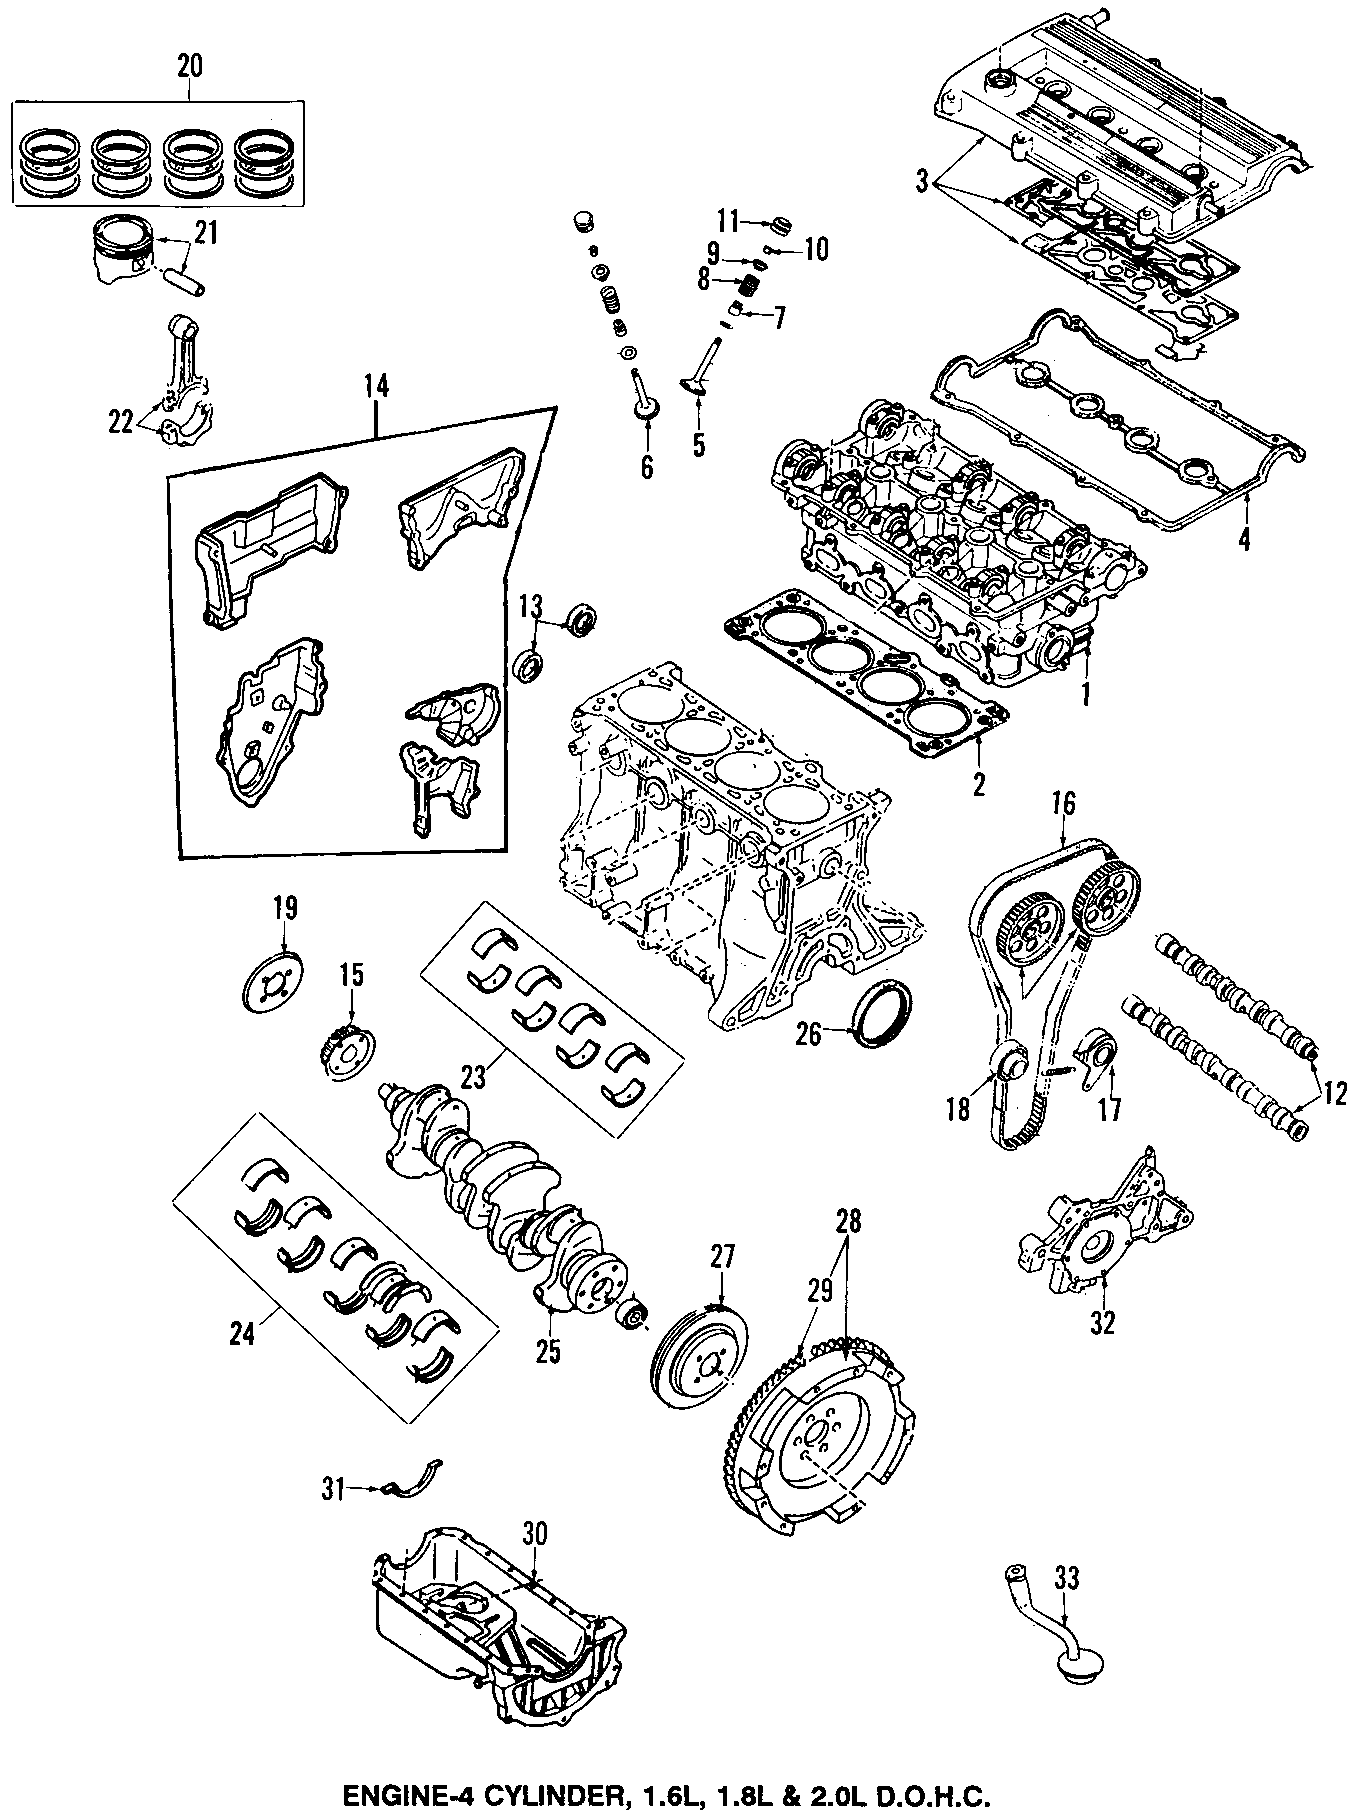 1996 Mazda Engine Connecting Rod - B6S711210E | charlotte ...